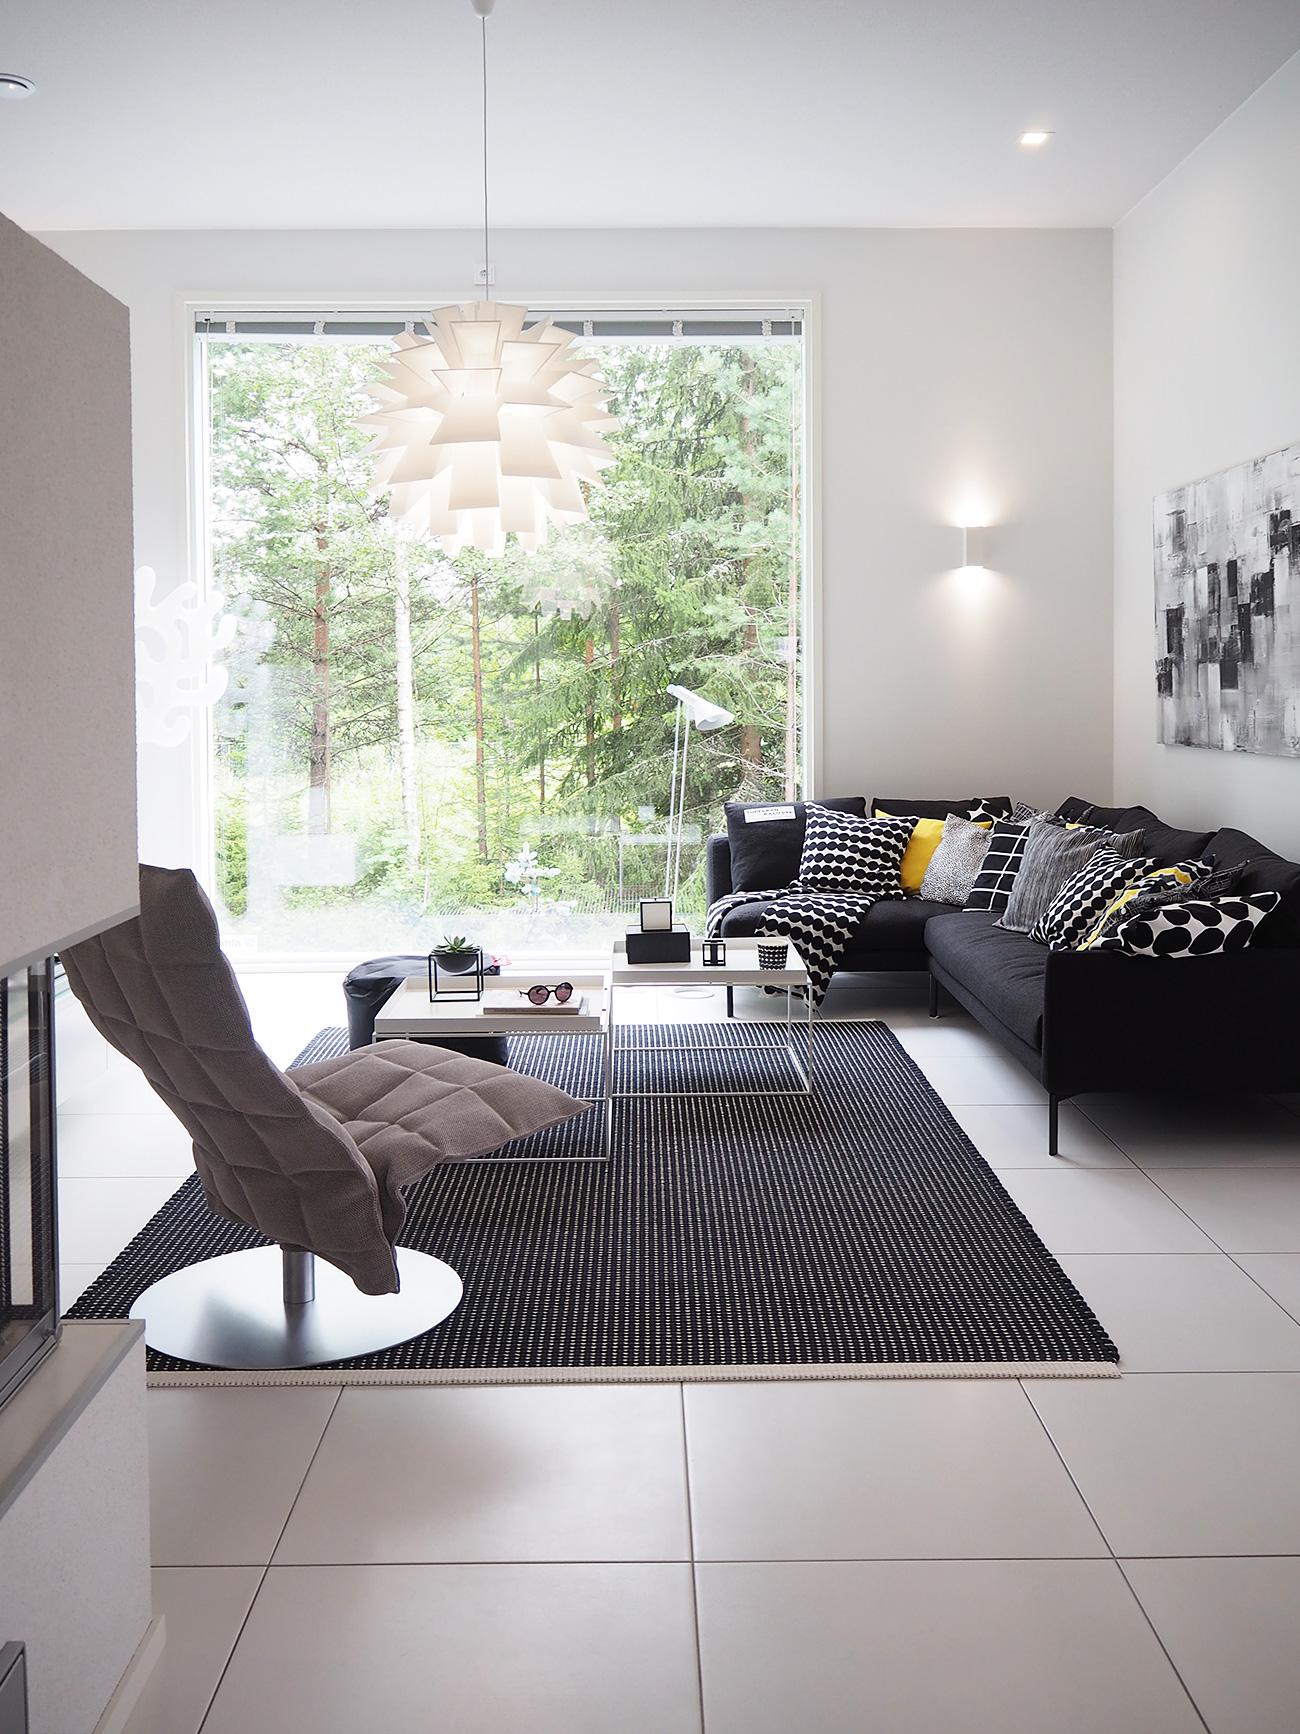 Olohuone kohteessa Cubo, Asuntomessut 2016 Seinäjoki